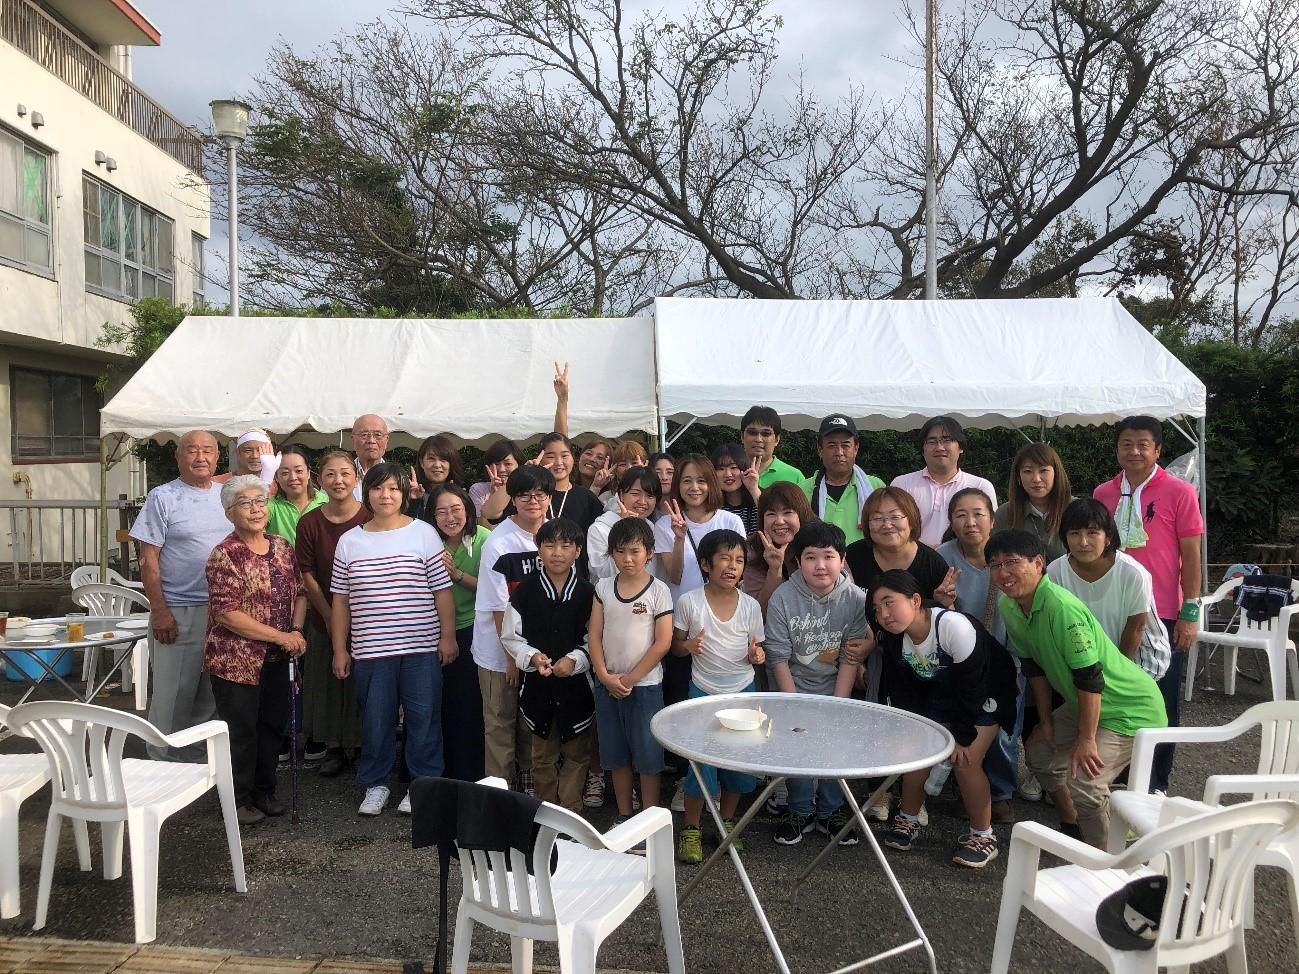 CHO主催行事ソフトボール大会参加と家族バーベキュー